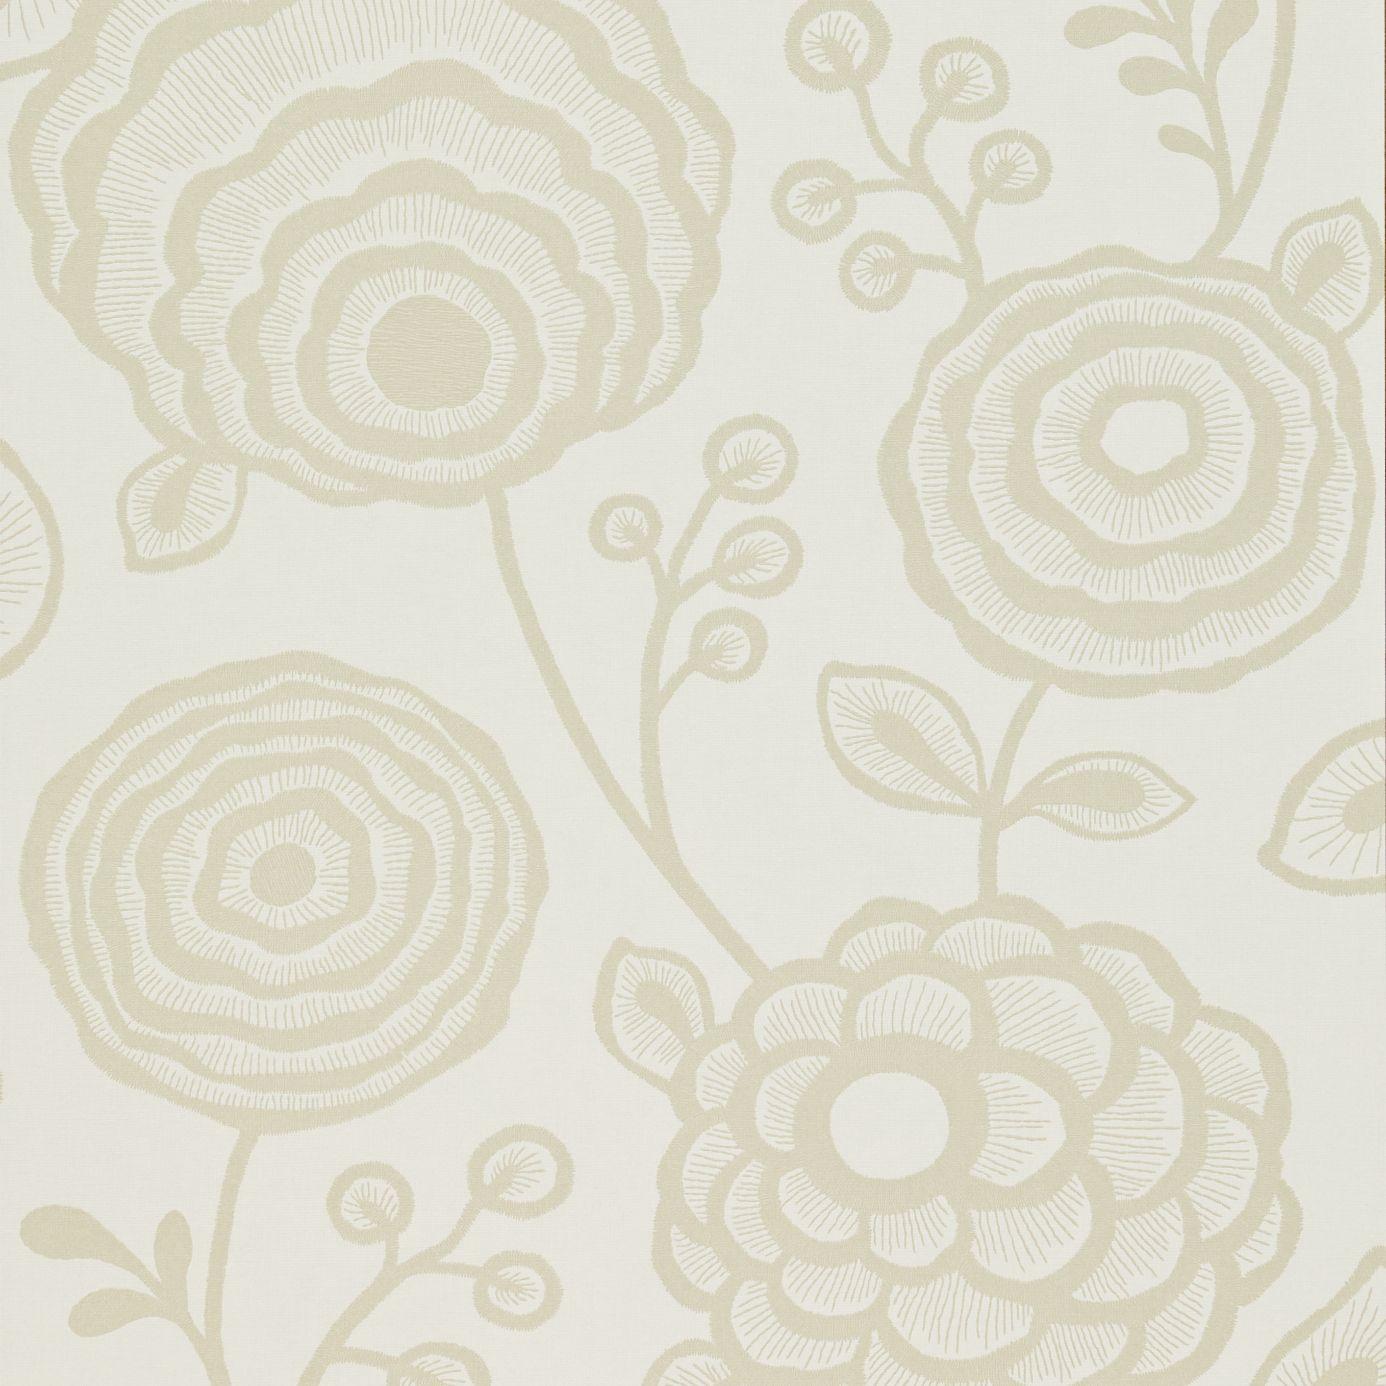 Harlequin Beatrice Wallpaper   White Neutral 110136 1386x1386